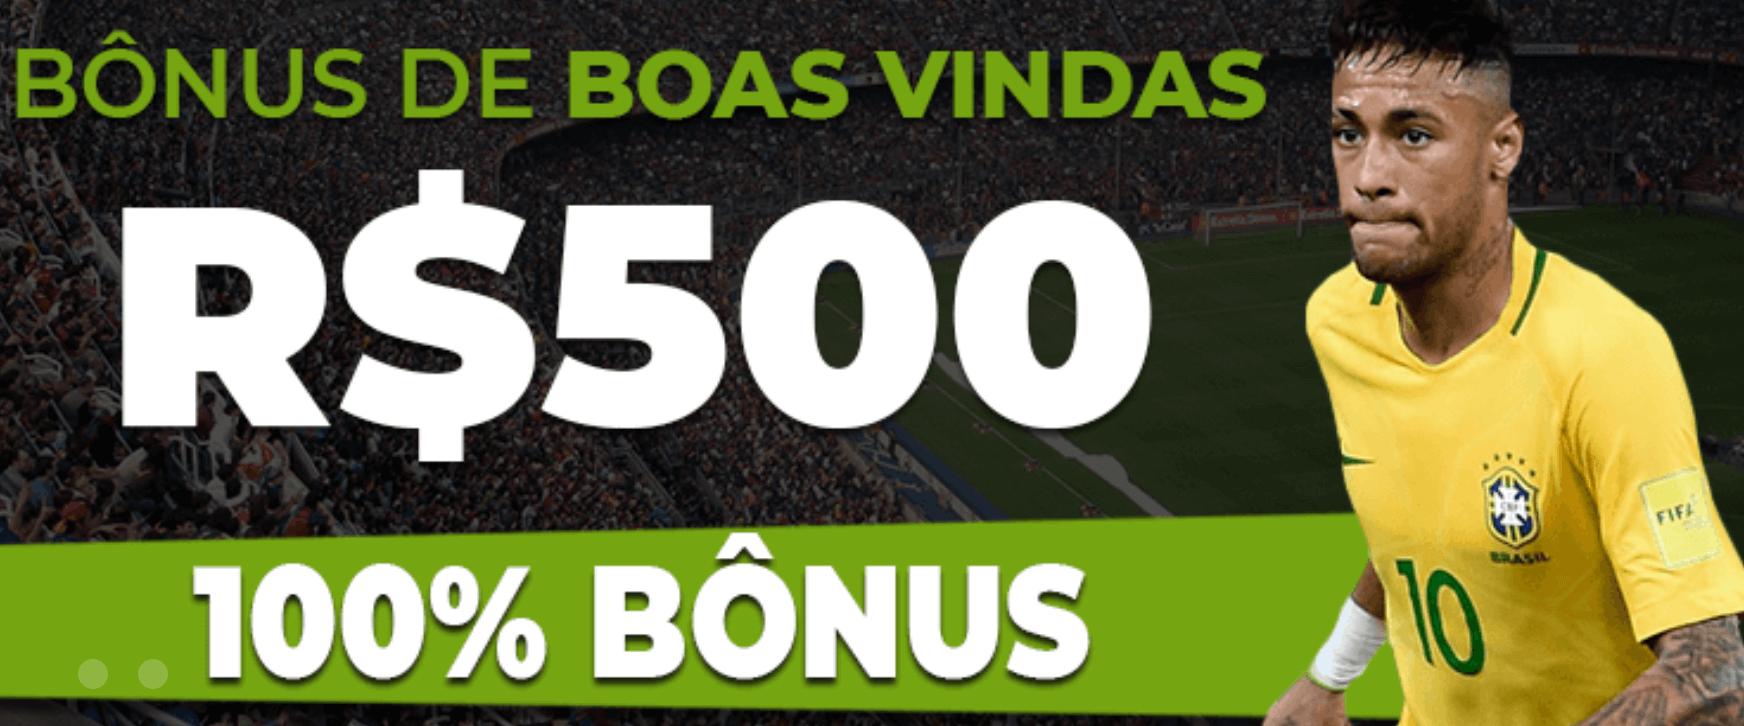 Bets 500 apostas online